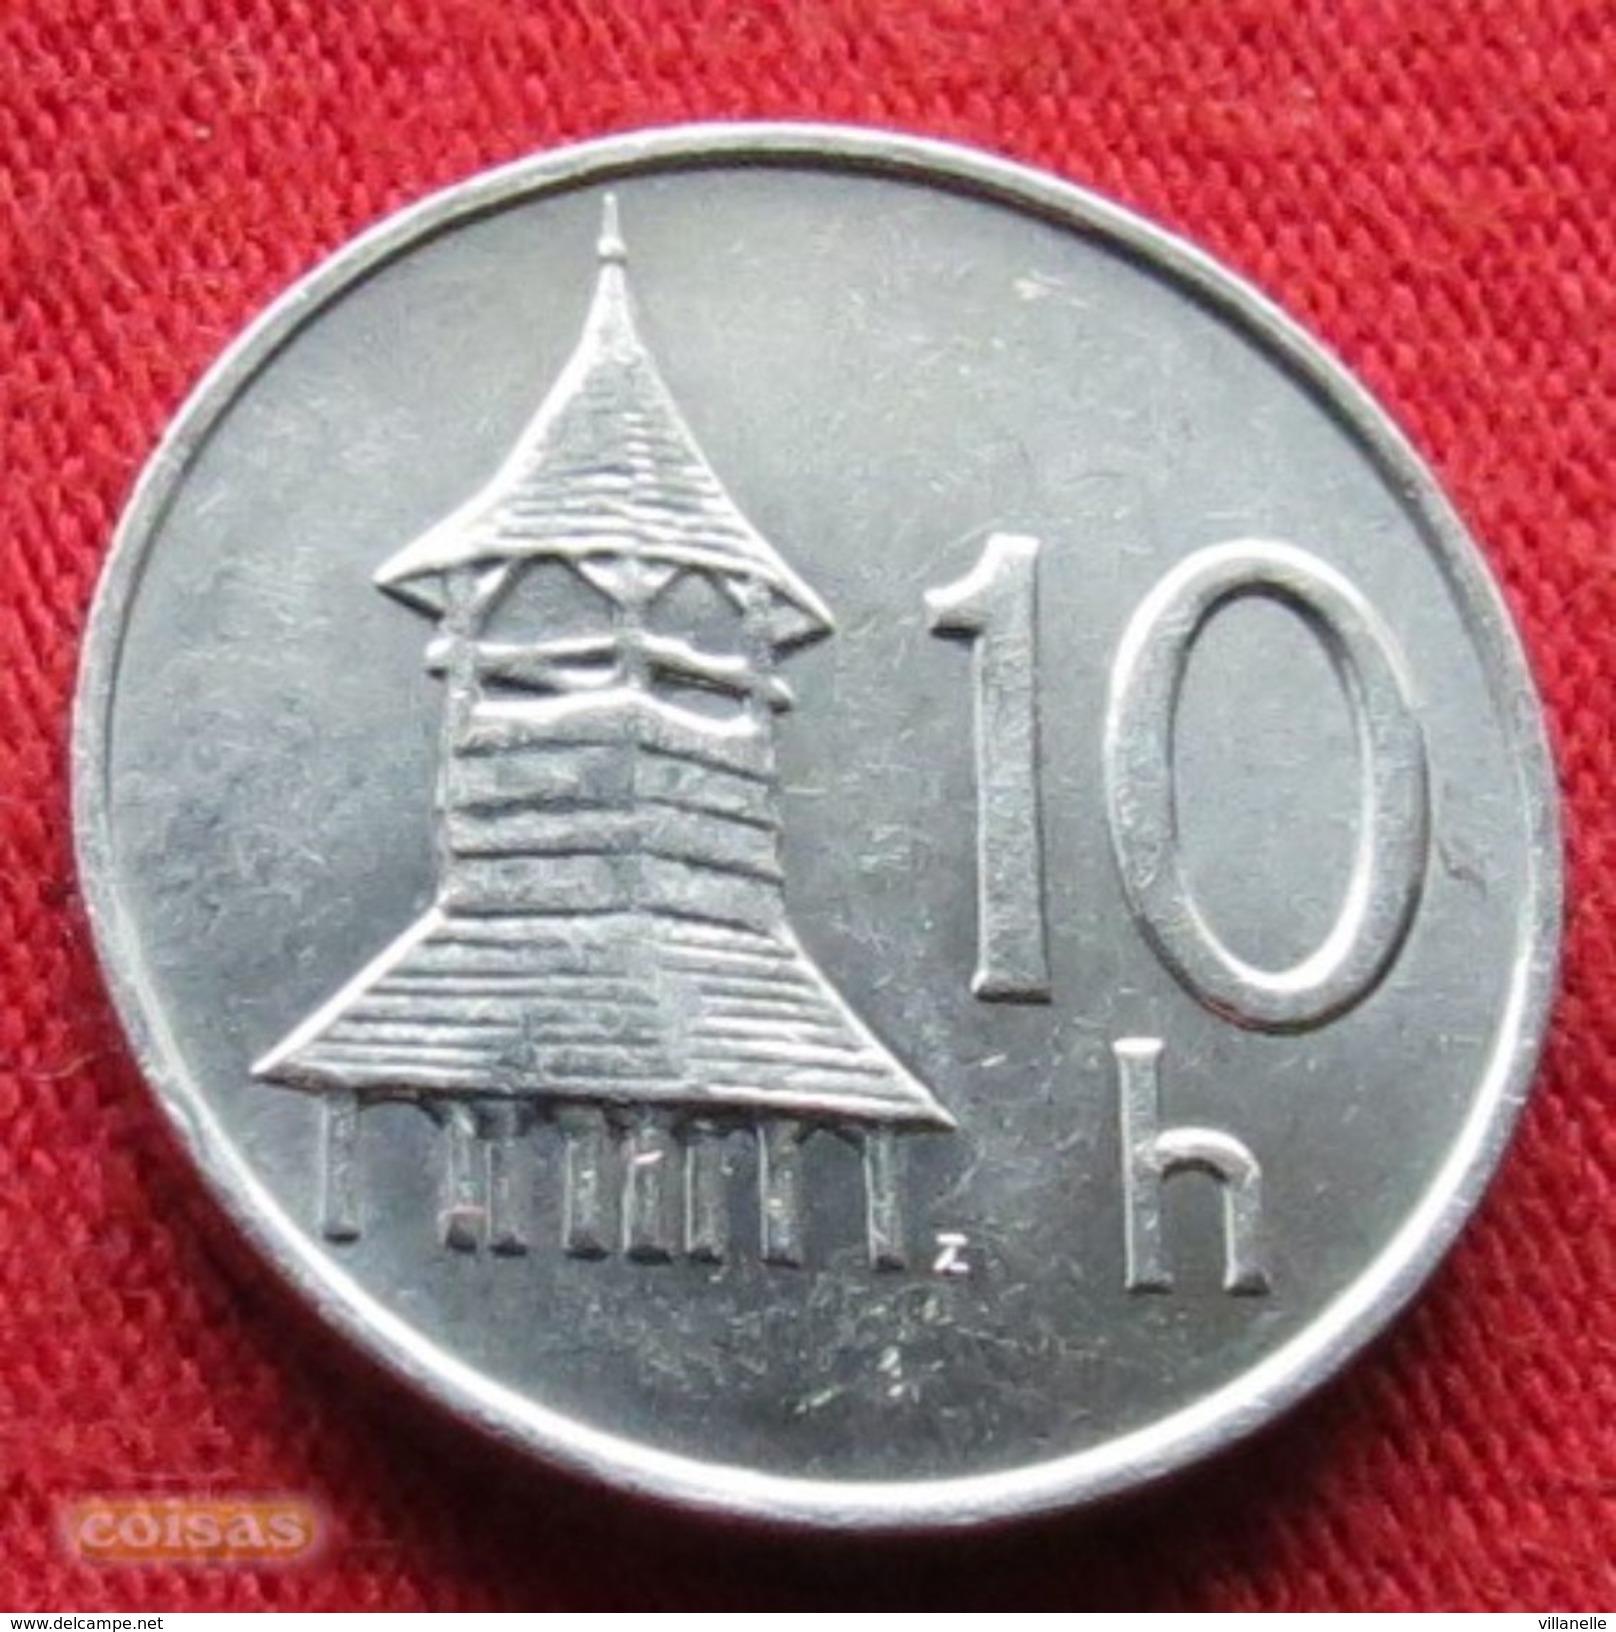 Slovakia 10 Halierov 1998 KM# 17 Eslovaquia Slovaquie - Slovakia